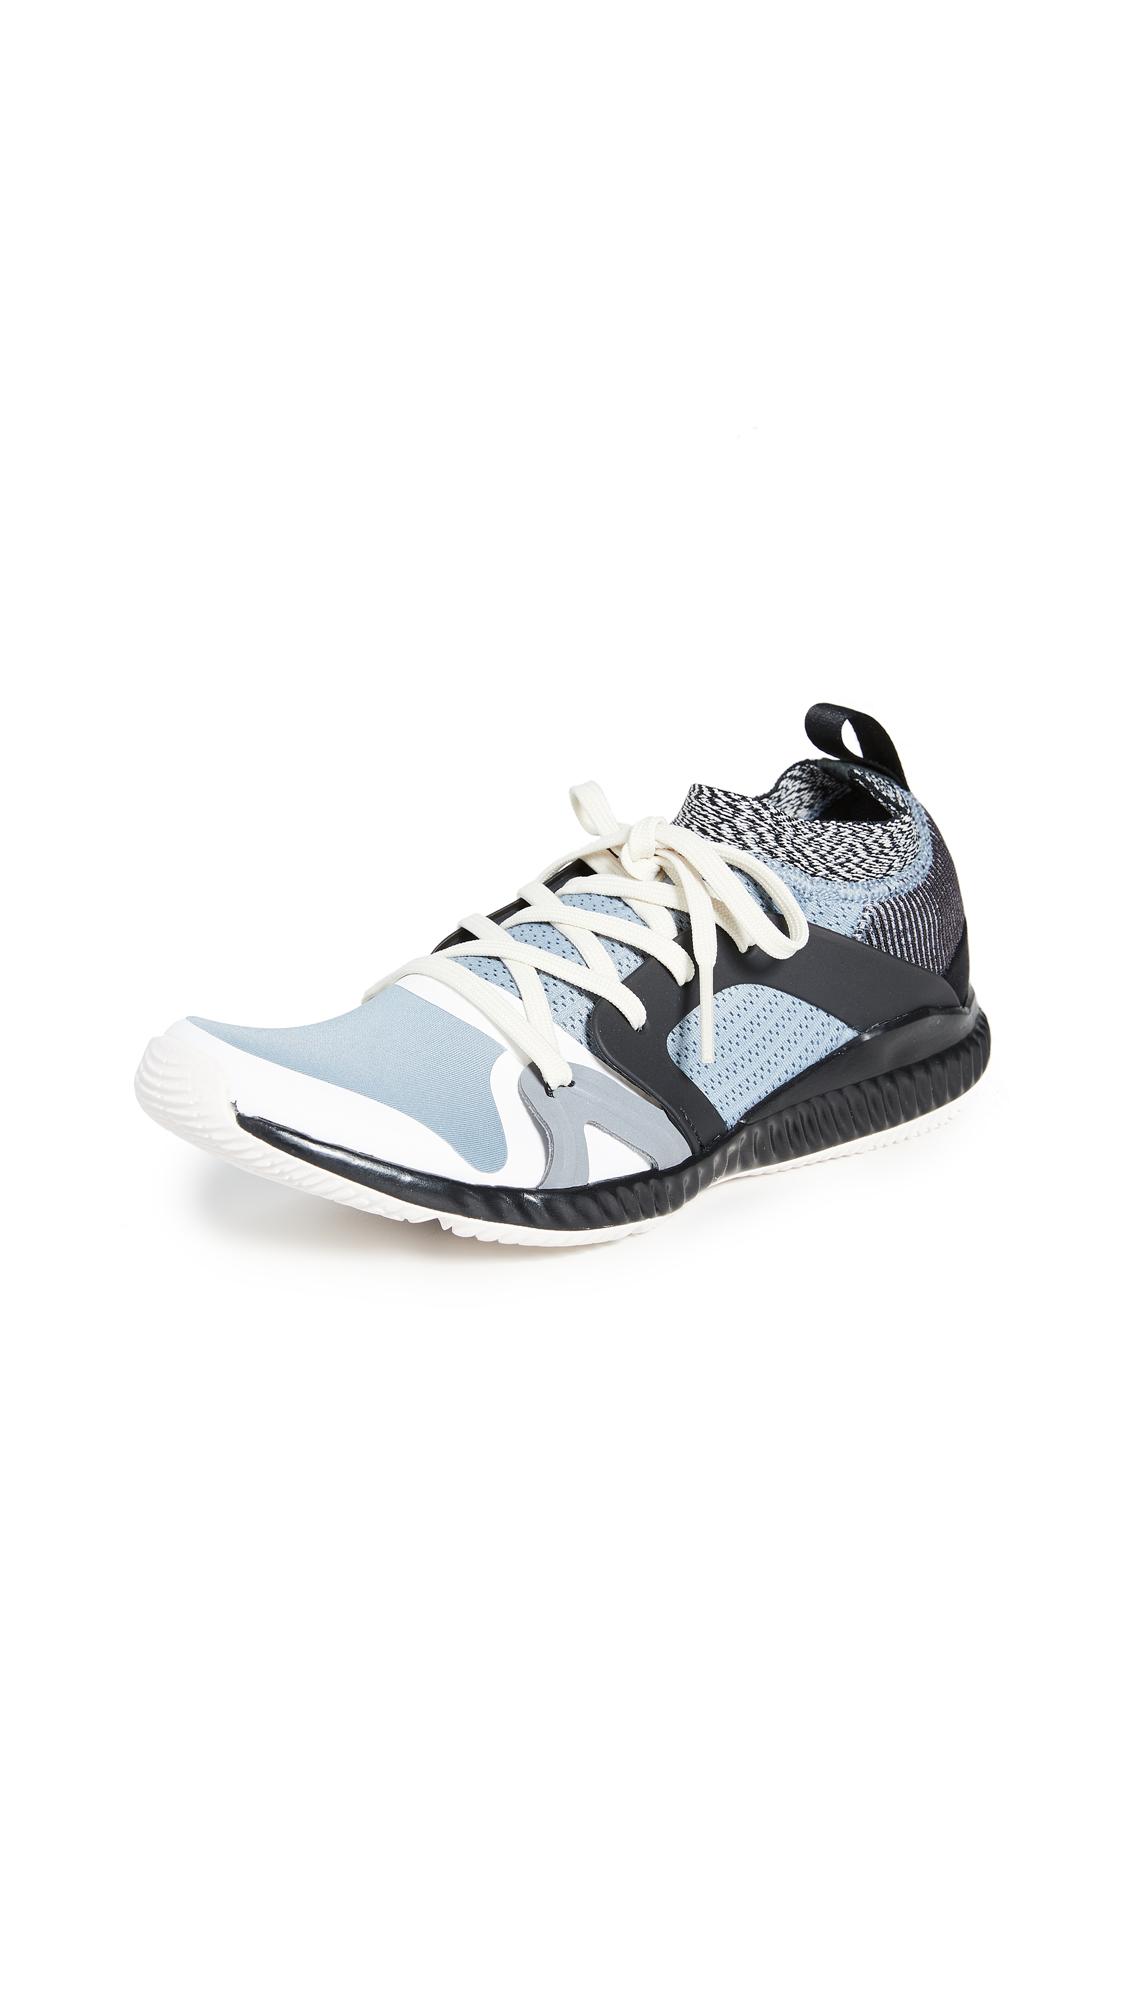 Buy adidas by Stella McCartney online - photo of adidas by Stella McCartney Crazytrain Pro S. Sneakers